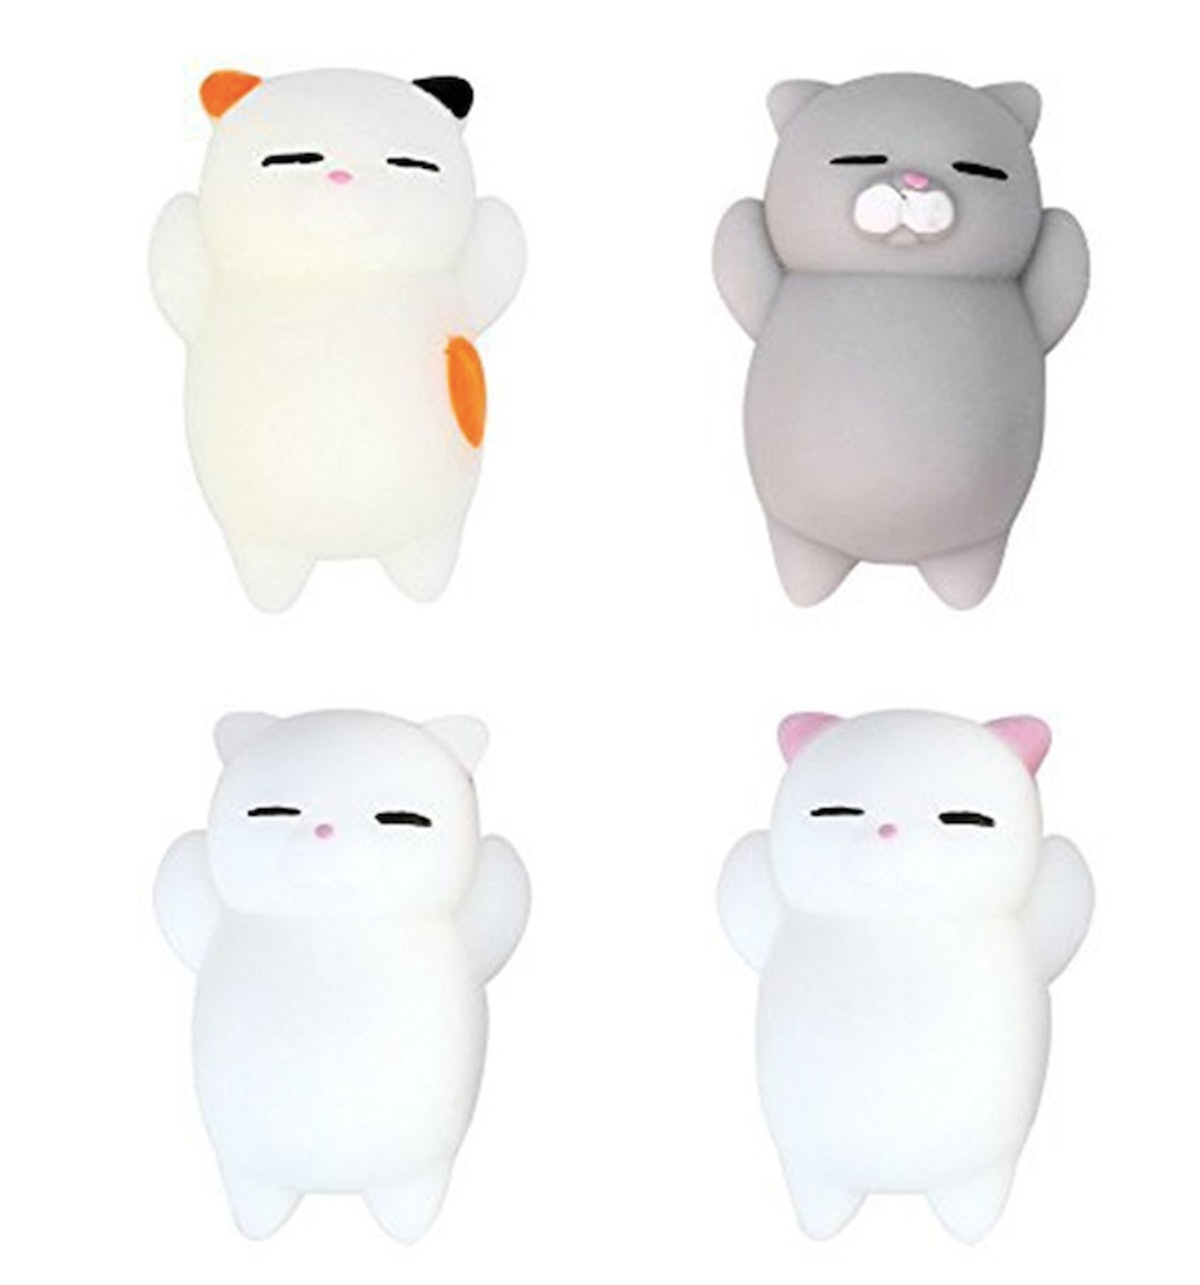 Eutrec Stress Squishy Toys (Set of 4)